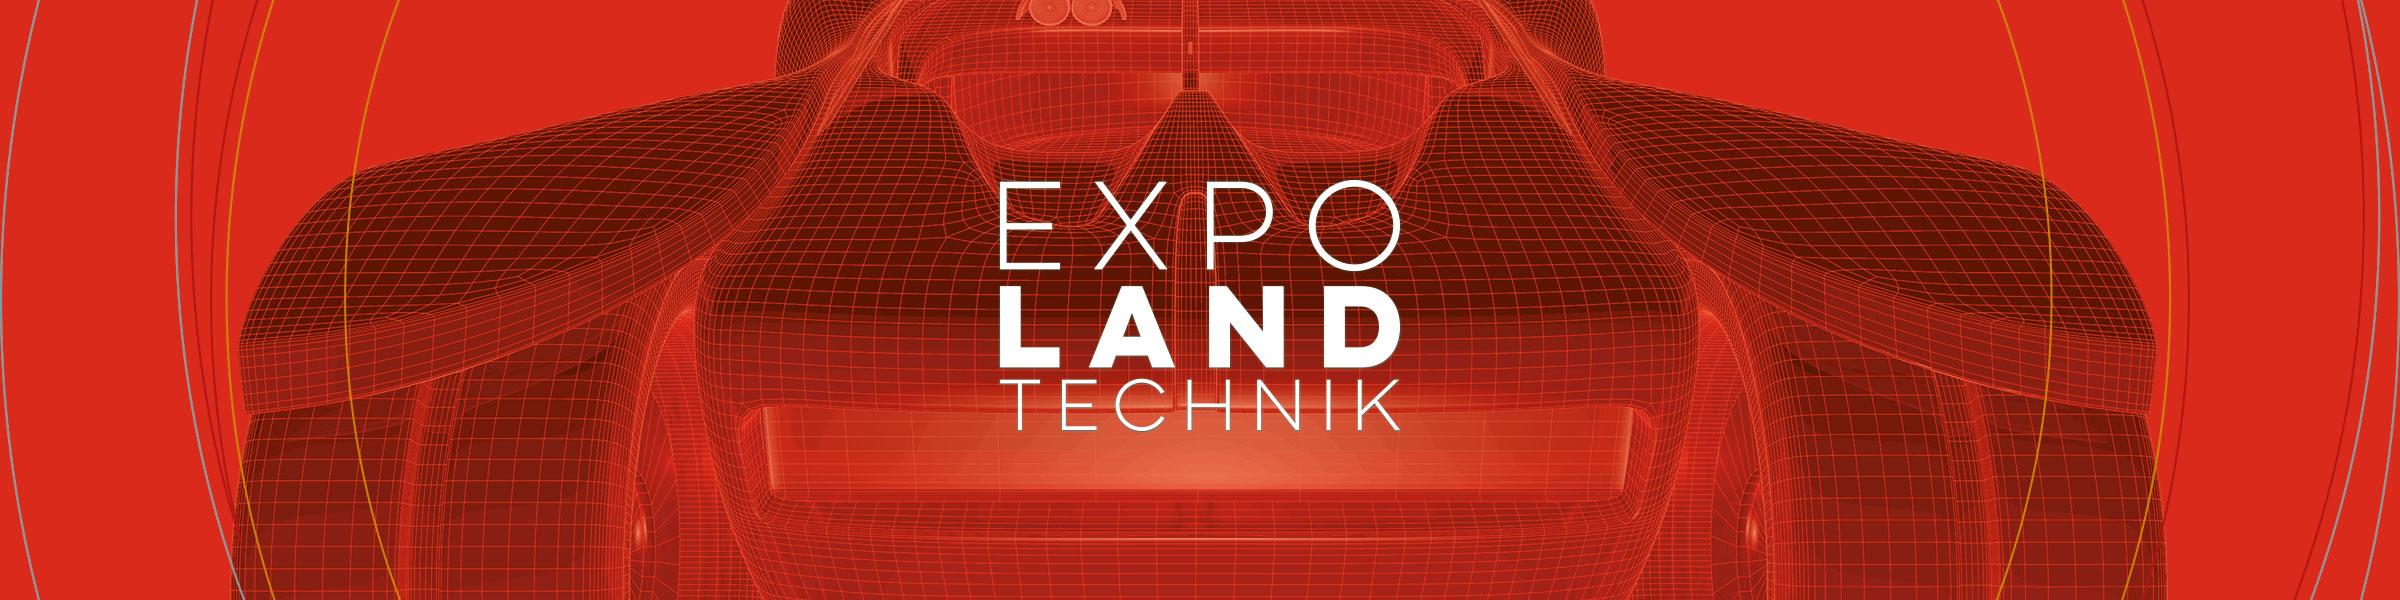 IONICA Header Expo Land Technik